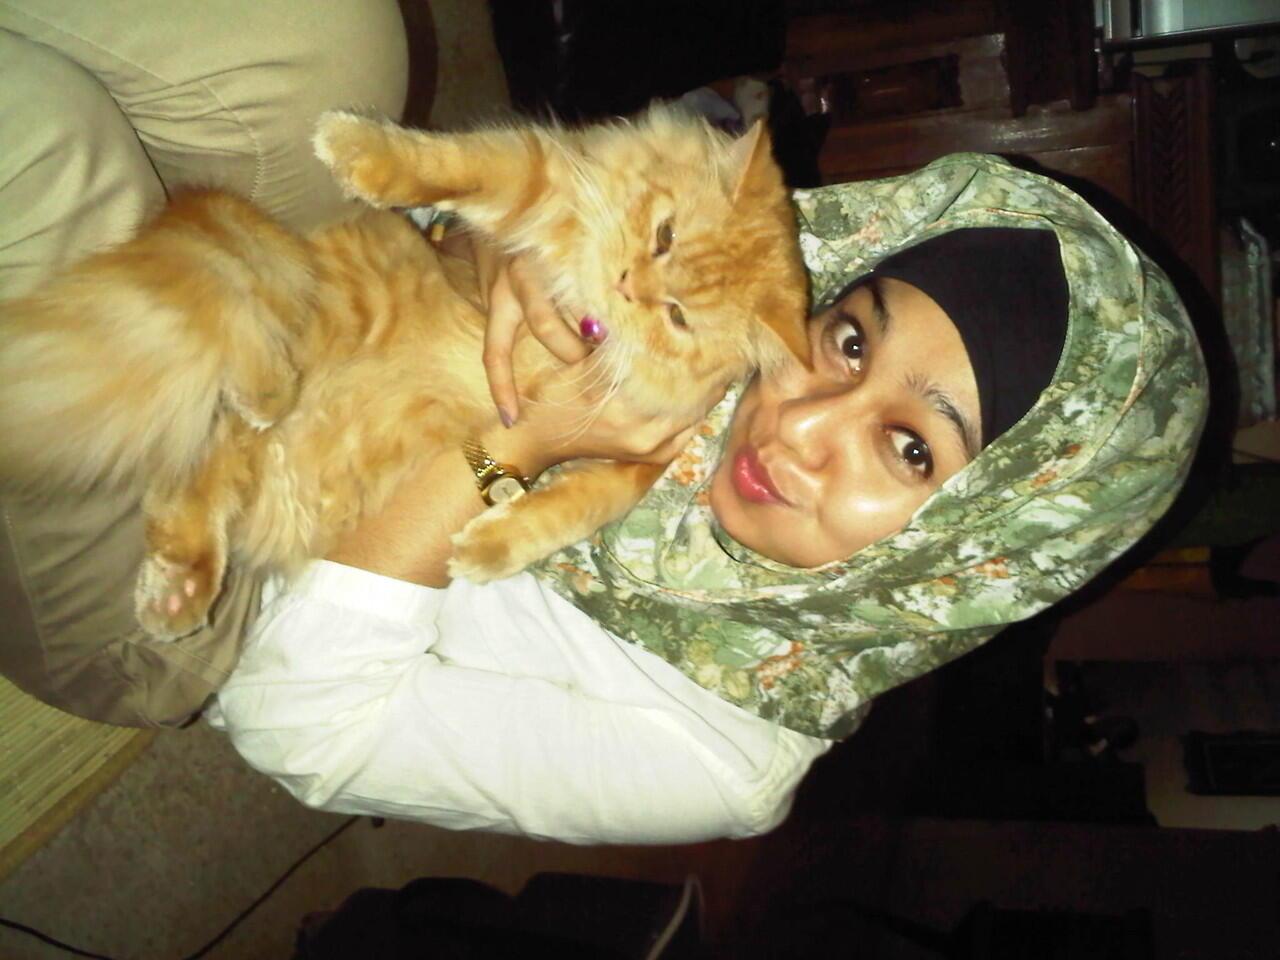 Cari kucing jantan selain ras kampung surabaya